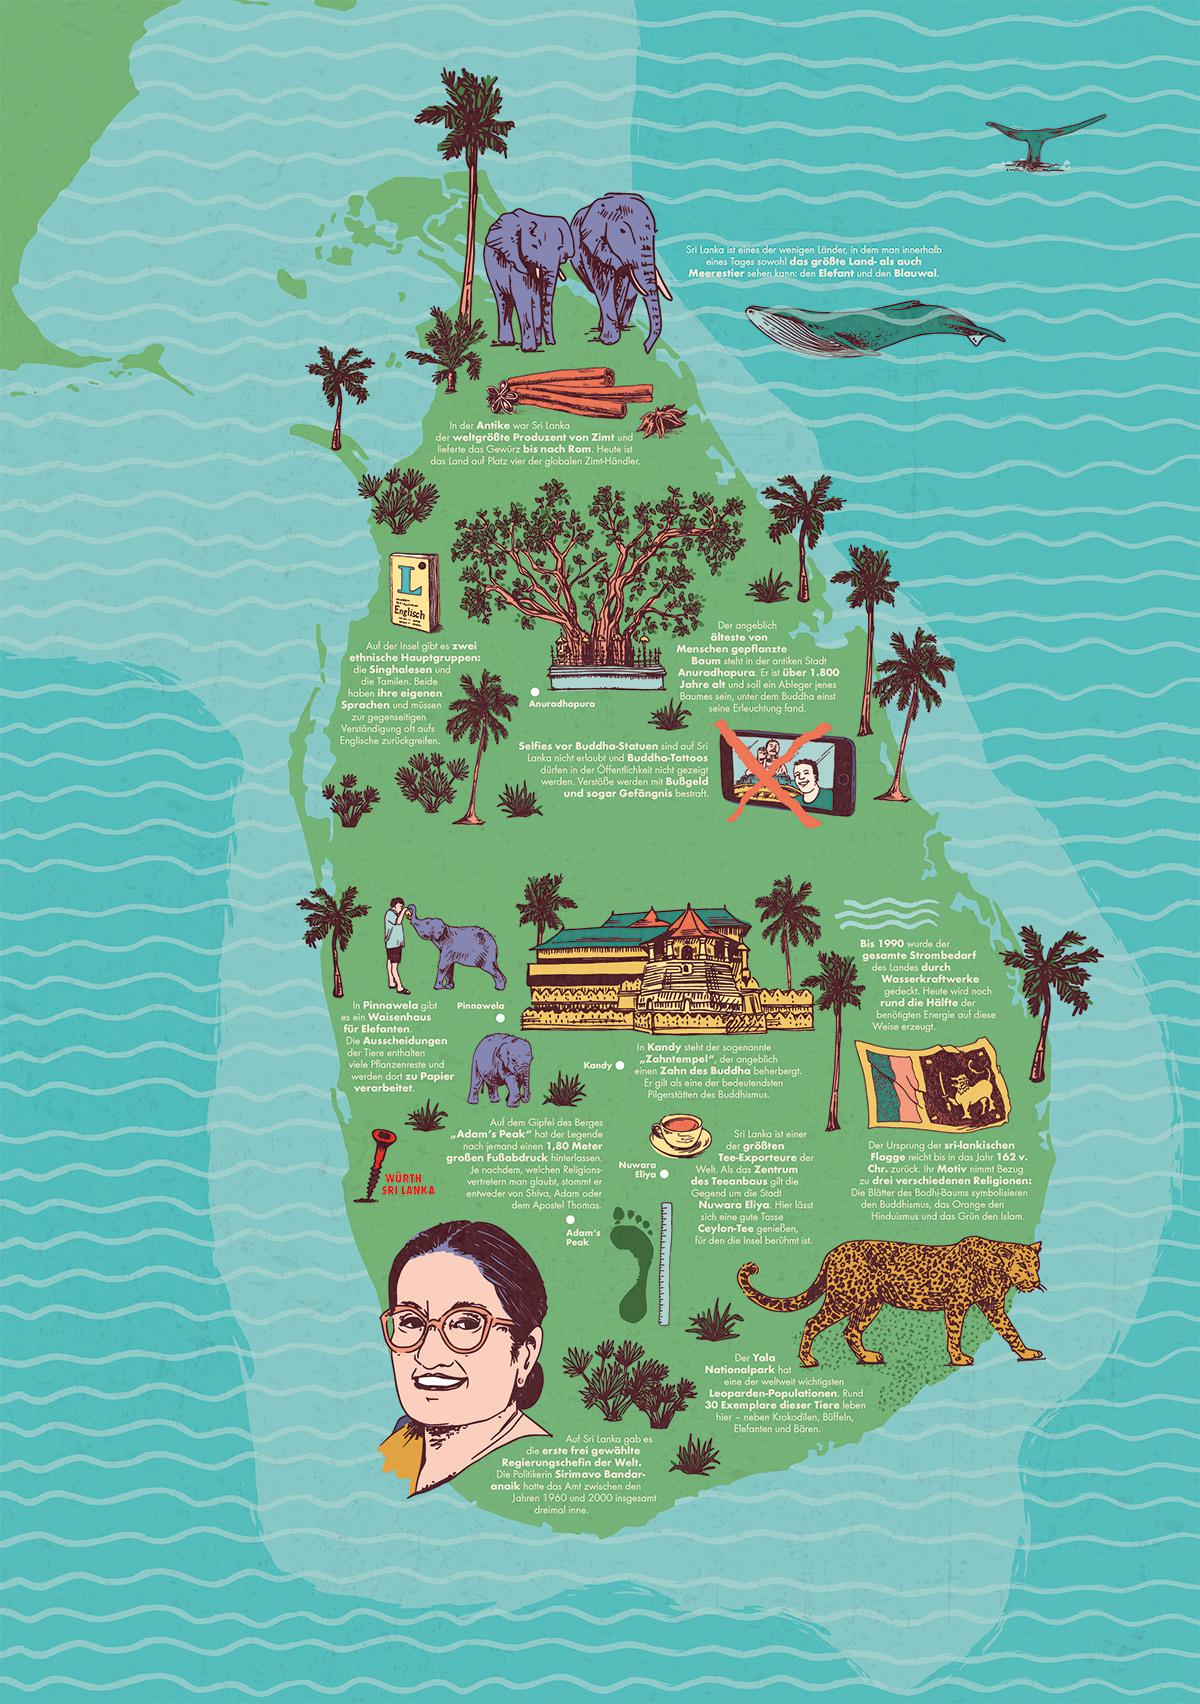 Illustrierte Karte von Sri Lanka für Magazin Editorial als Vektorgrafik. Marina Schilling